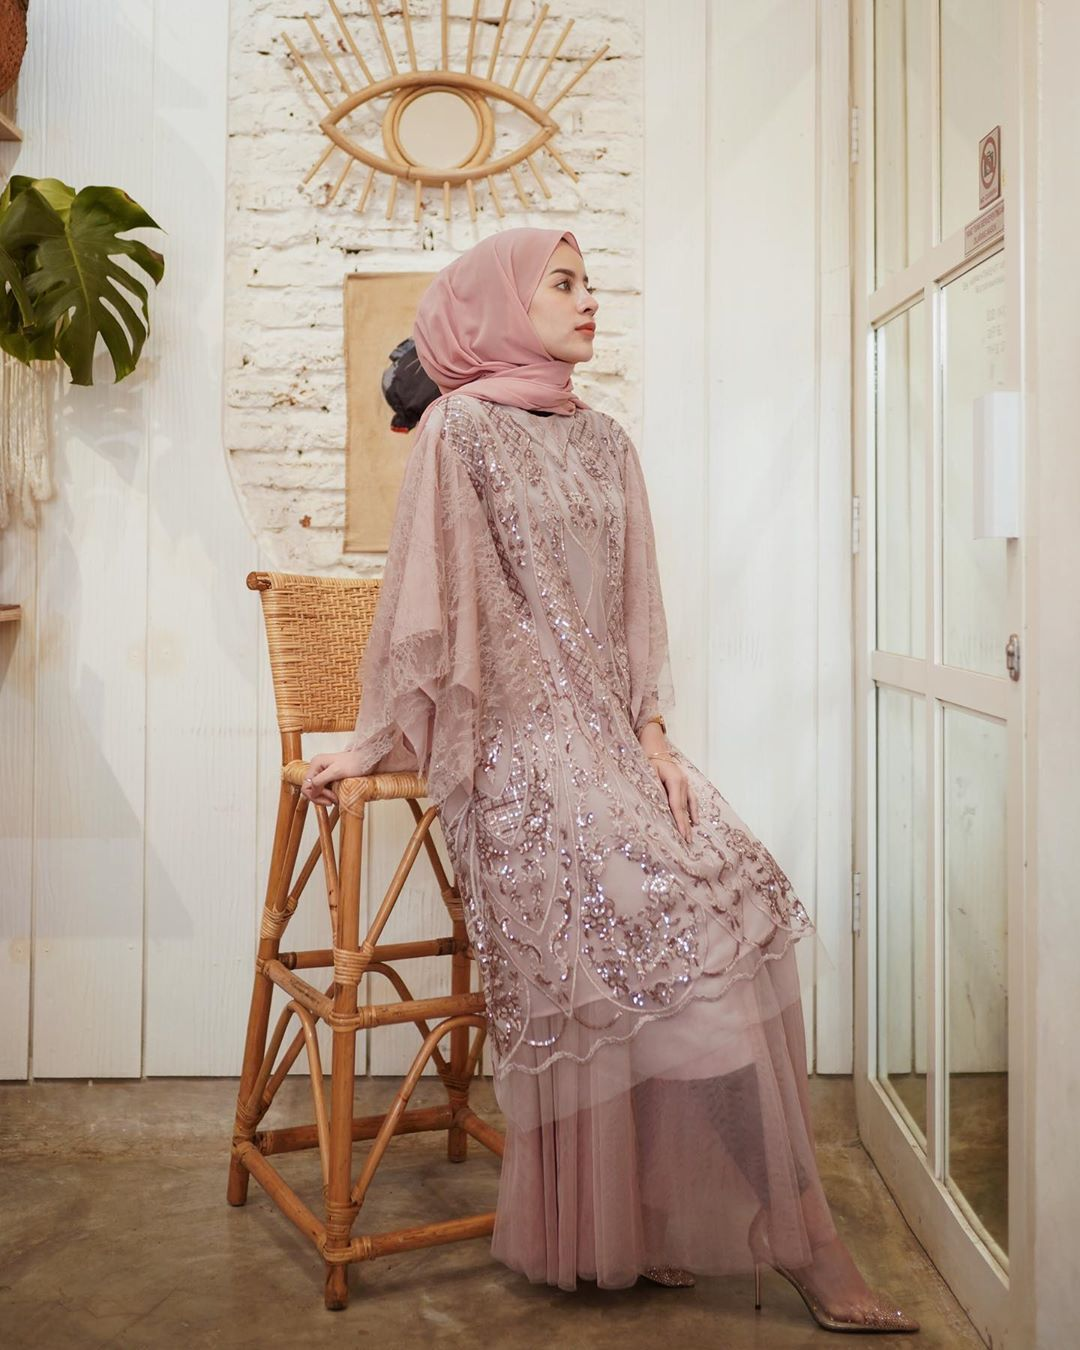 whatta beautiful dress from @ask_byasky @askyfebrianti wanna cri